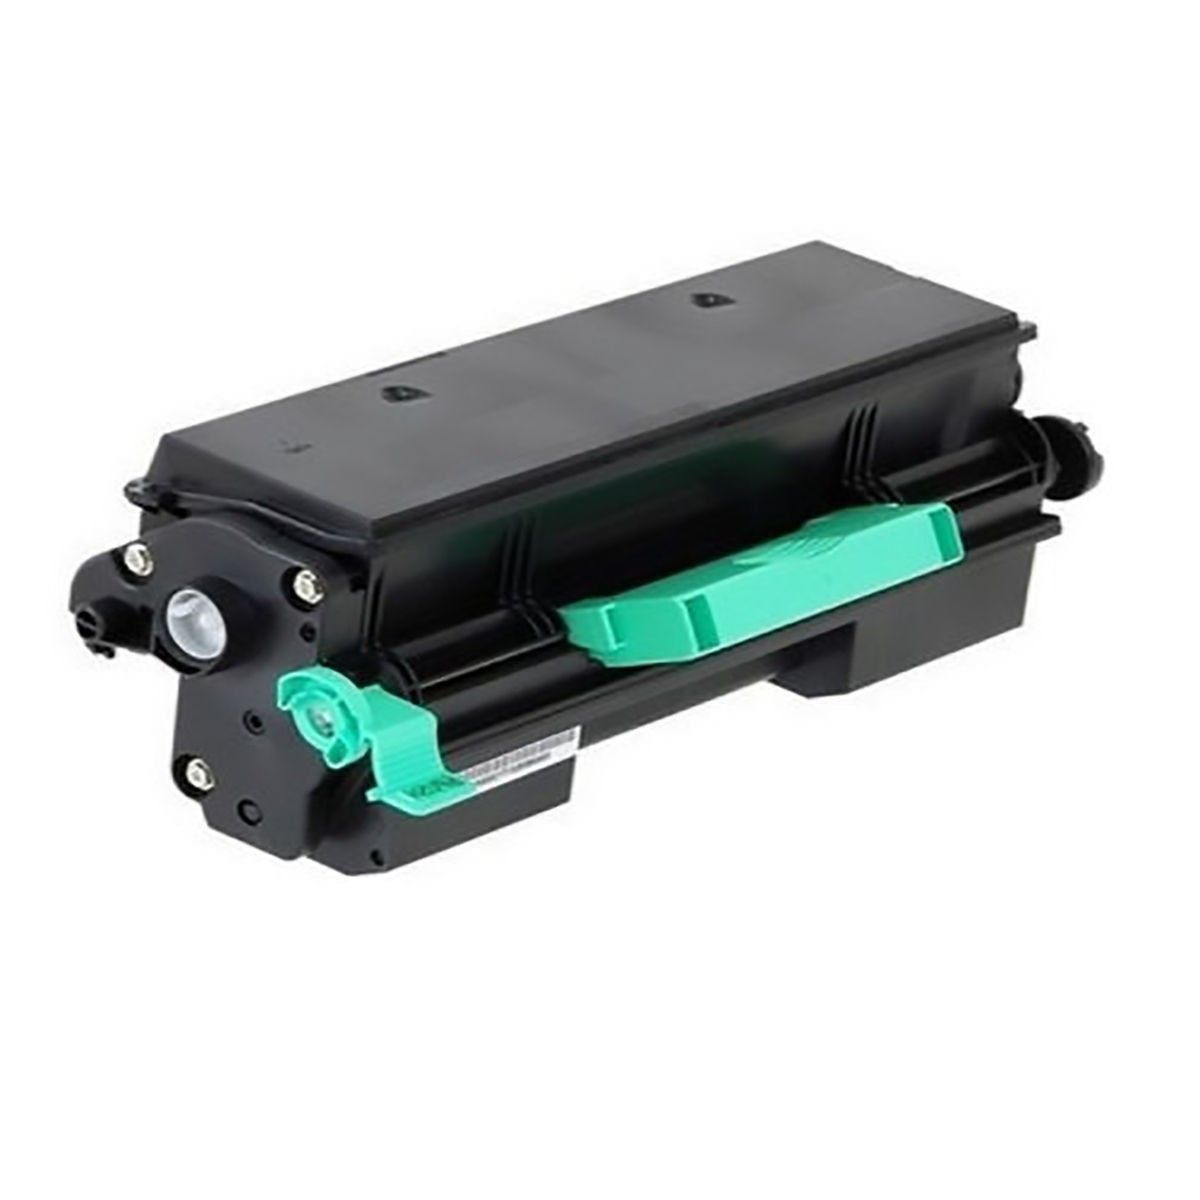 Compatível: Toner MP401 para Ricoh MP402 MP452 MP-401spf SP-4520d MP401spf MP452dw SP4520 SP4520dn / Preto / 10.400